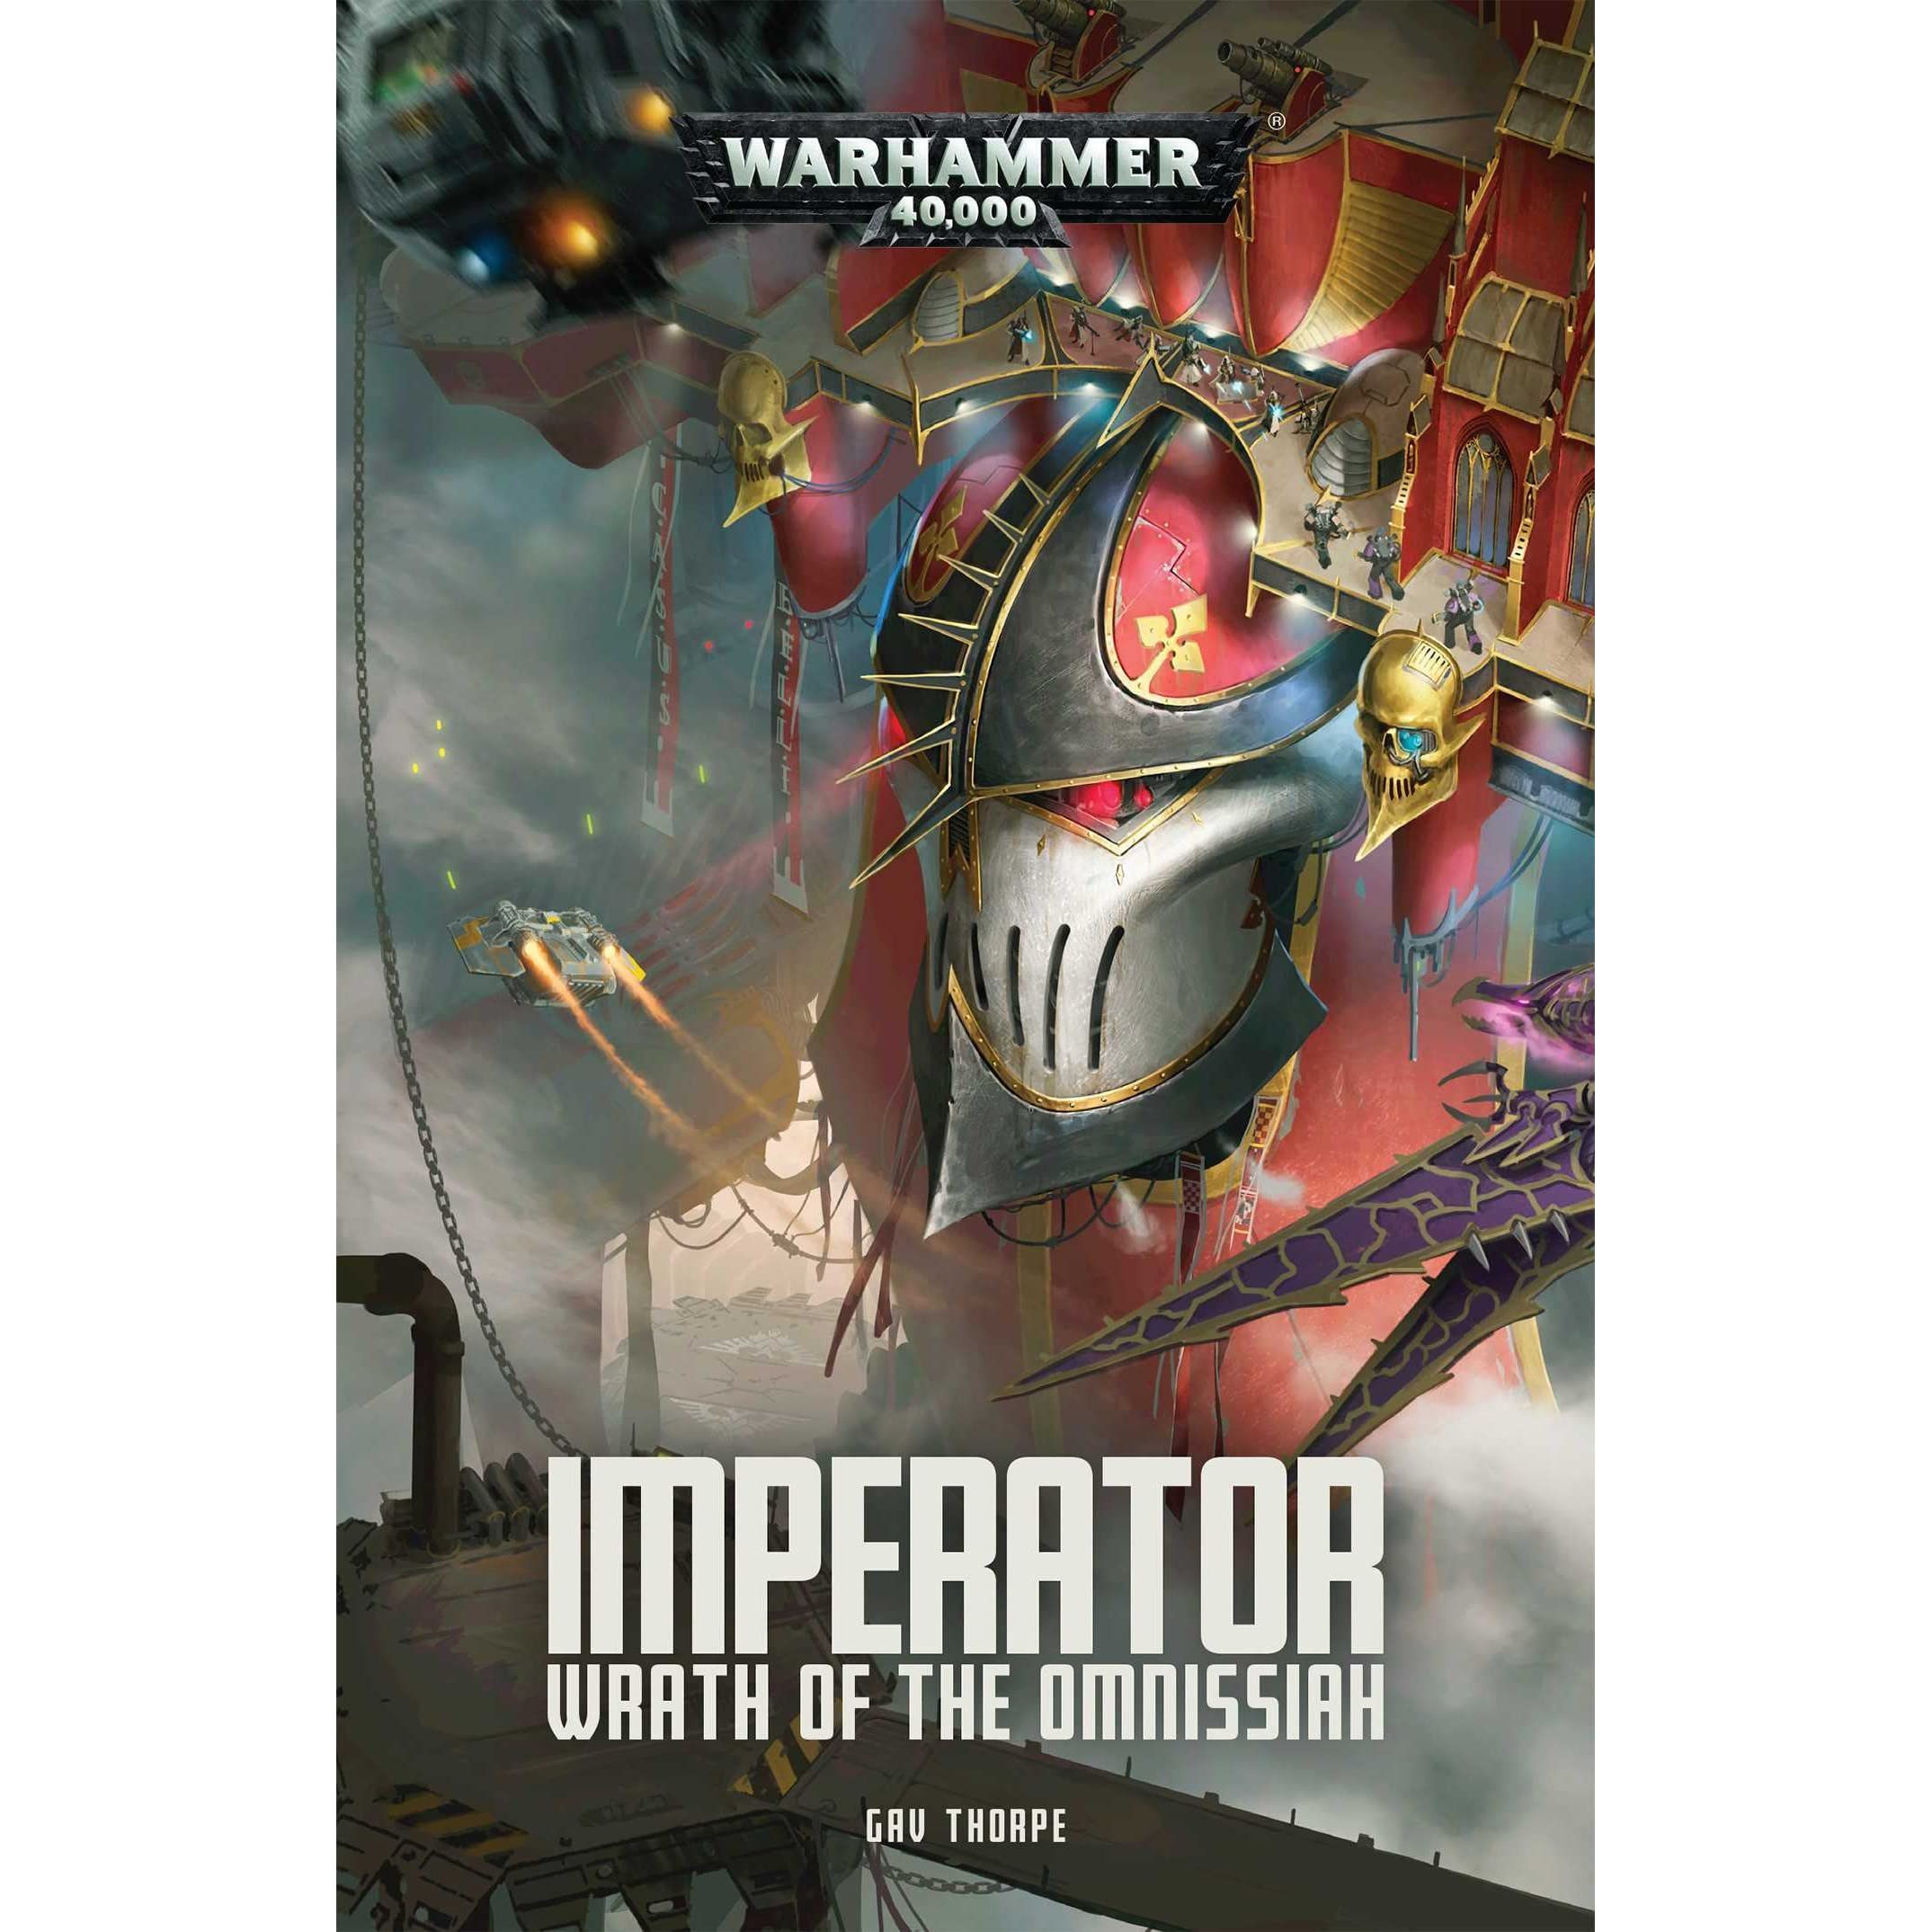 Imperator: Wrath of the Omnissiah by Gav Thorpe